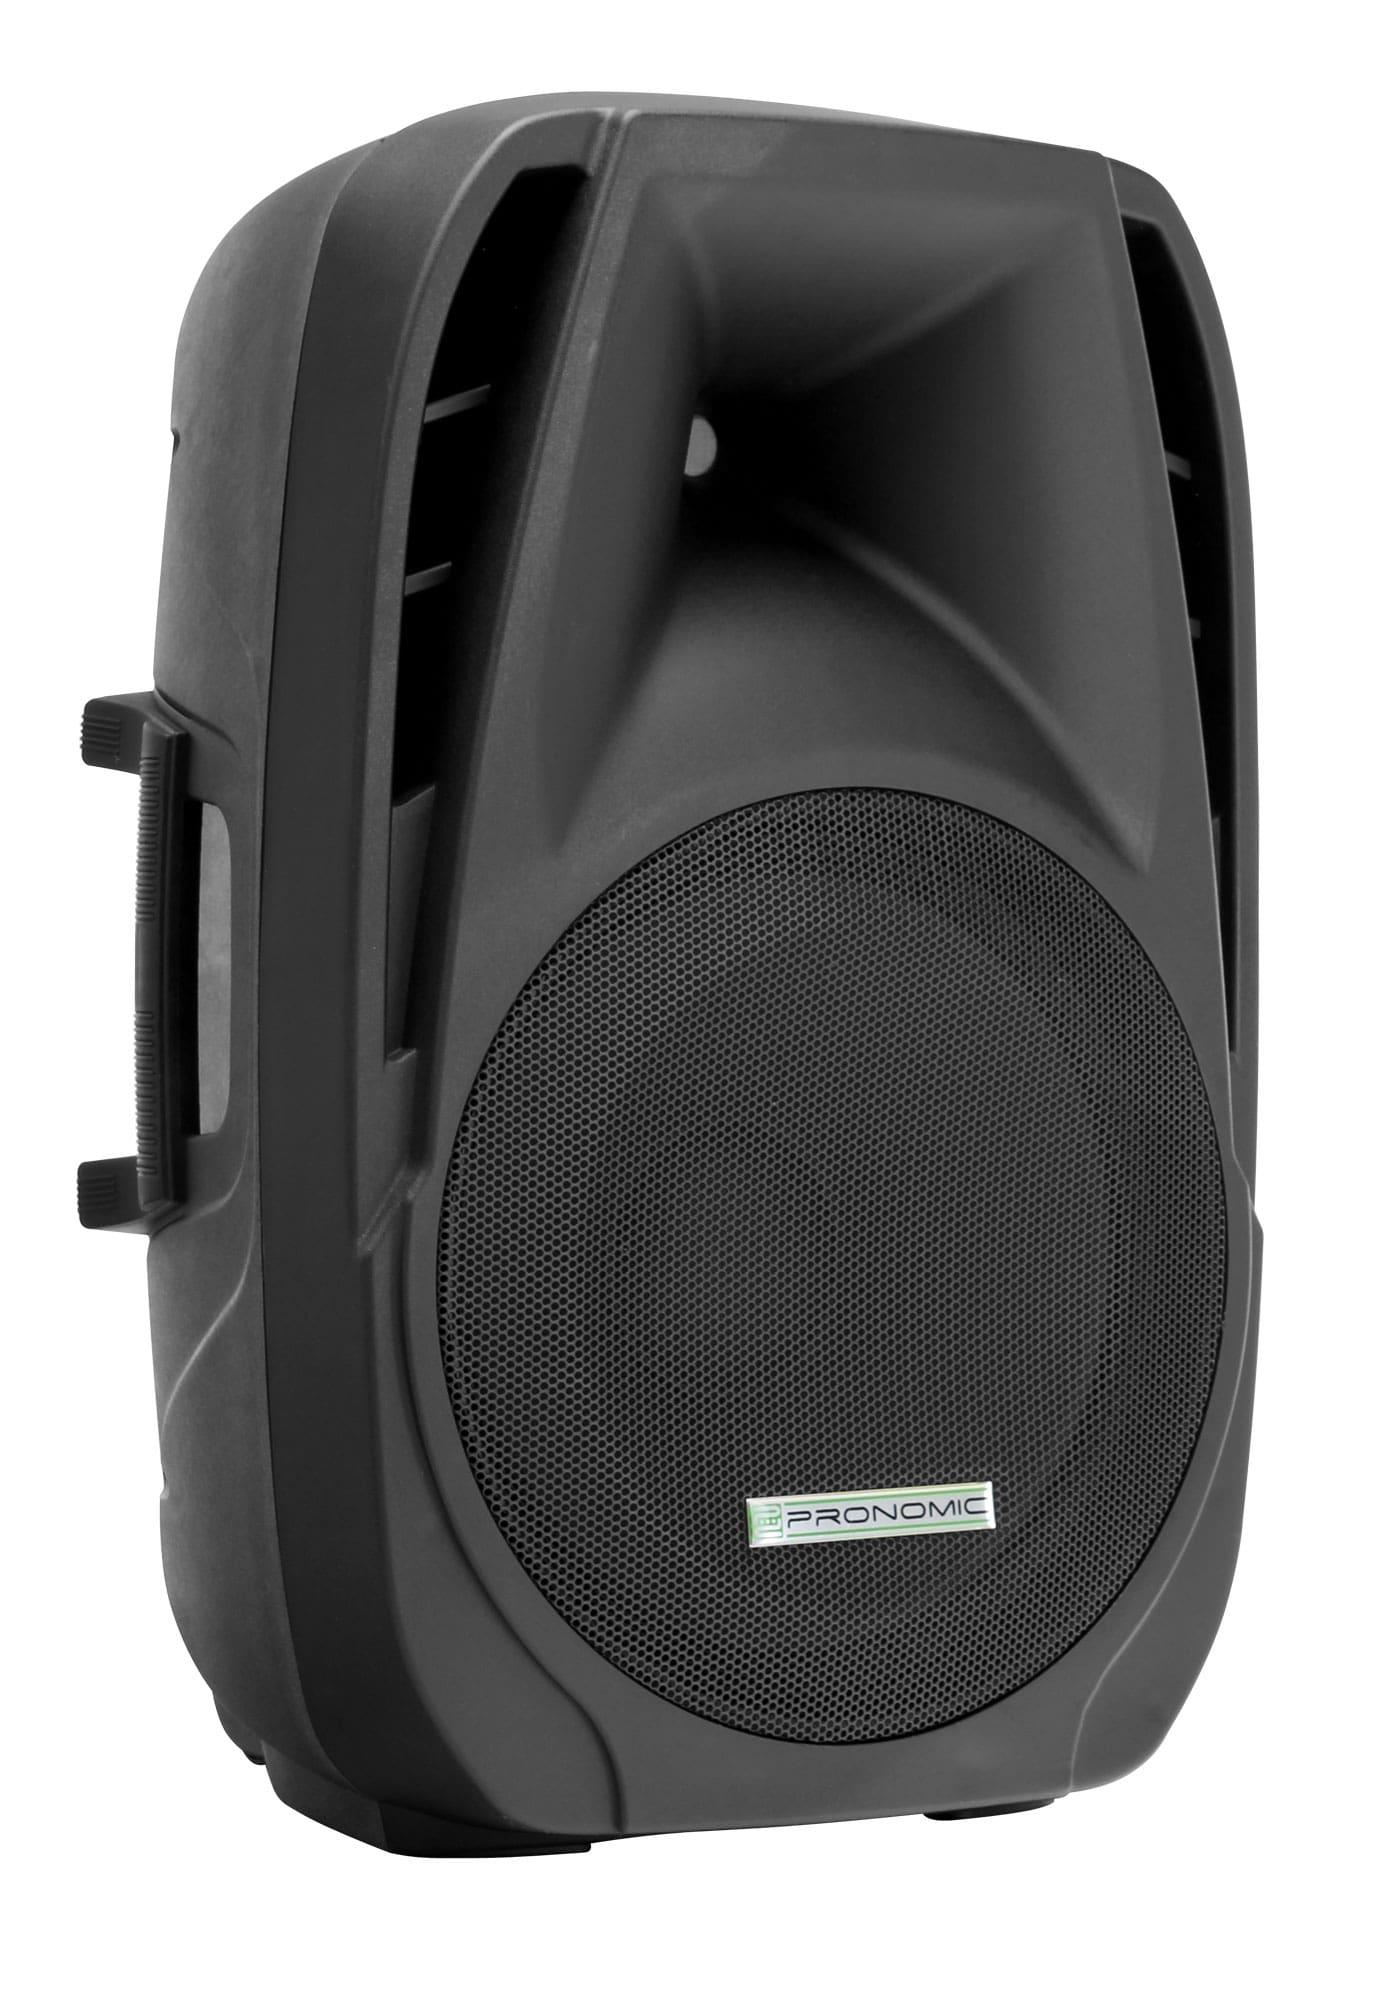 Pronomic PH15A Aktivbox Lautsprecher MP3|Bluetooth 200|350 Watt Retoure (Zustand akzeptabel)